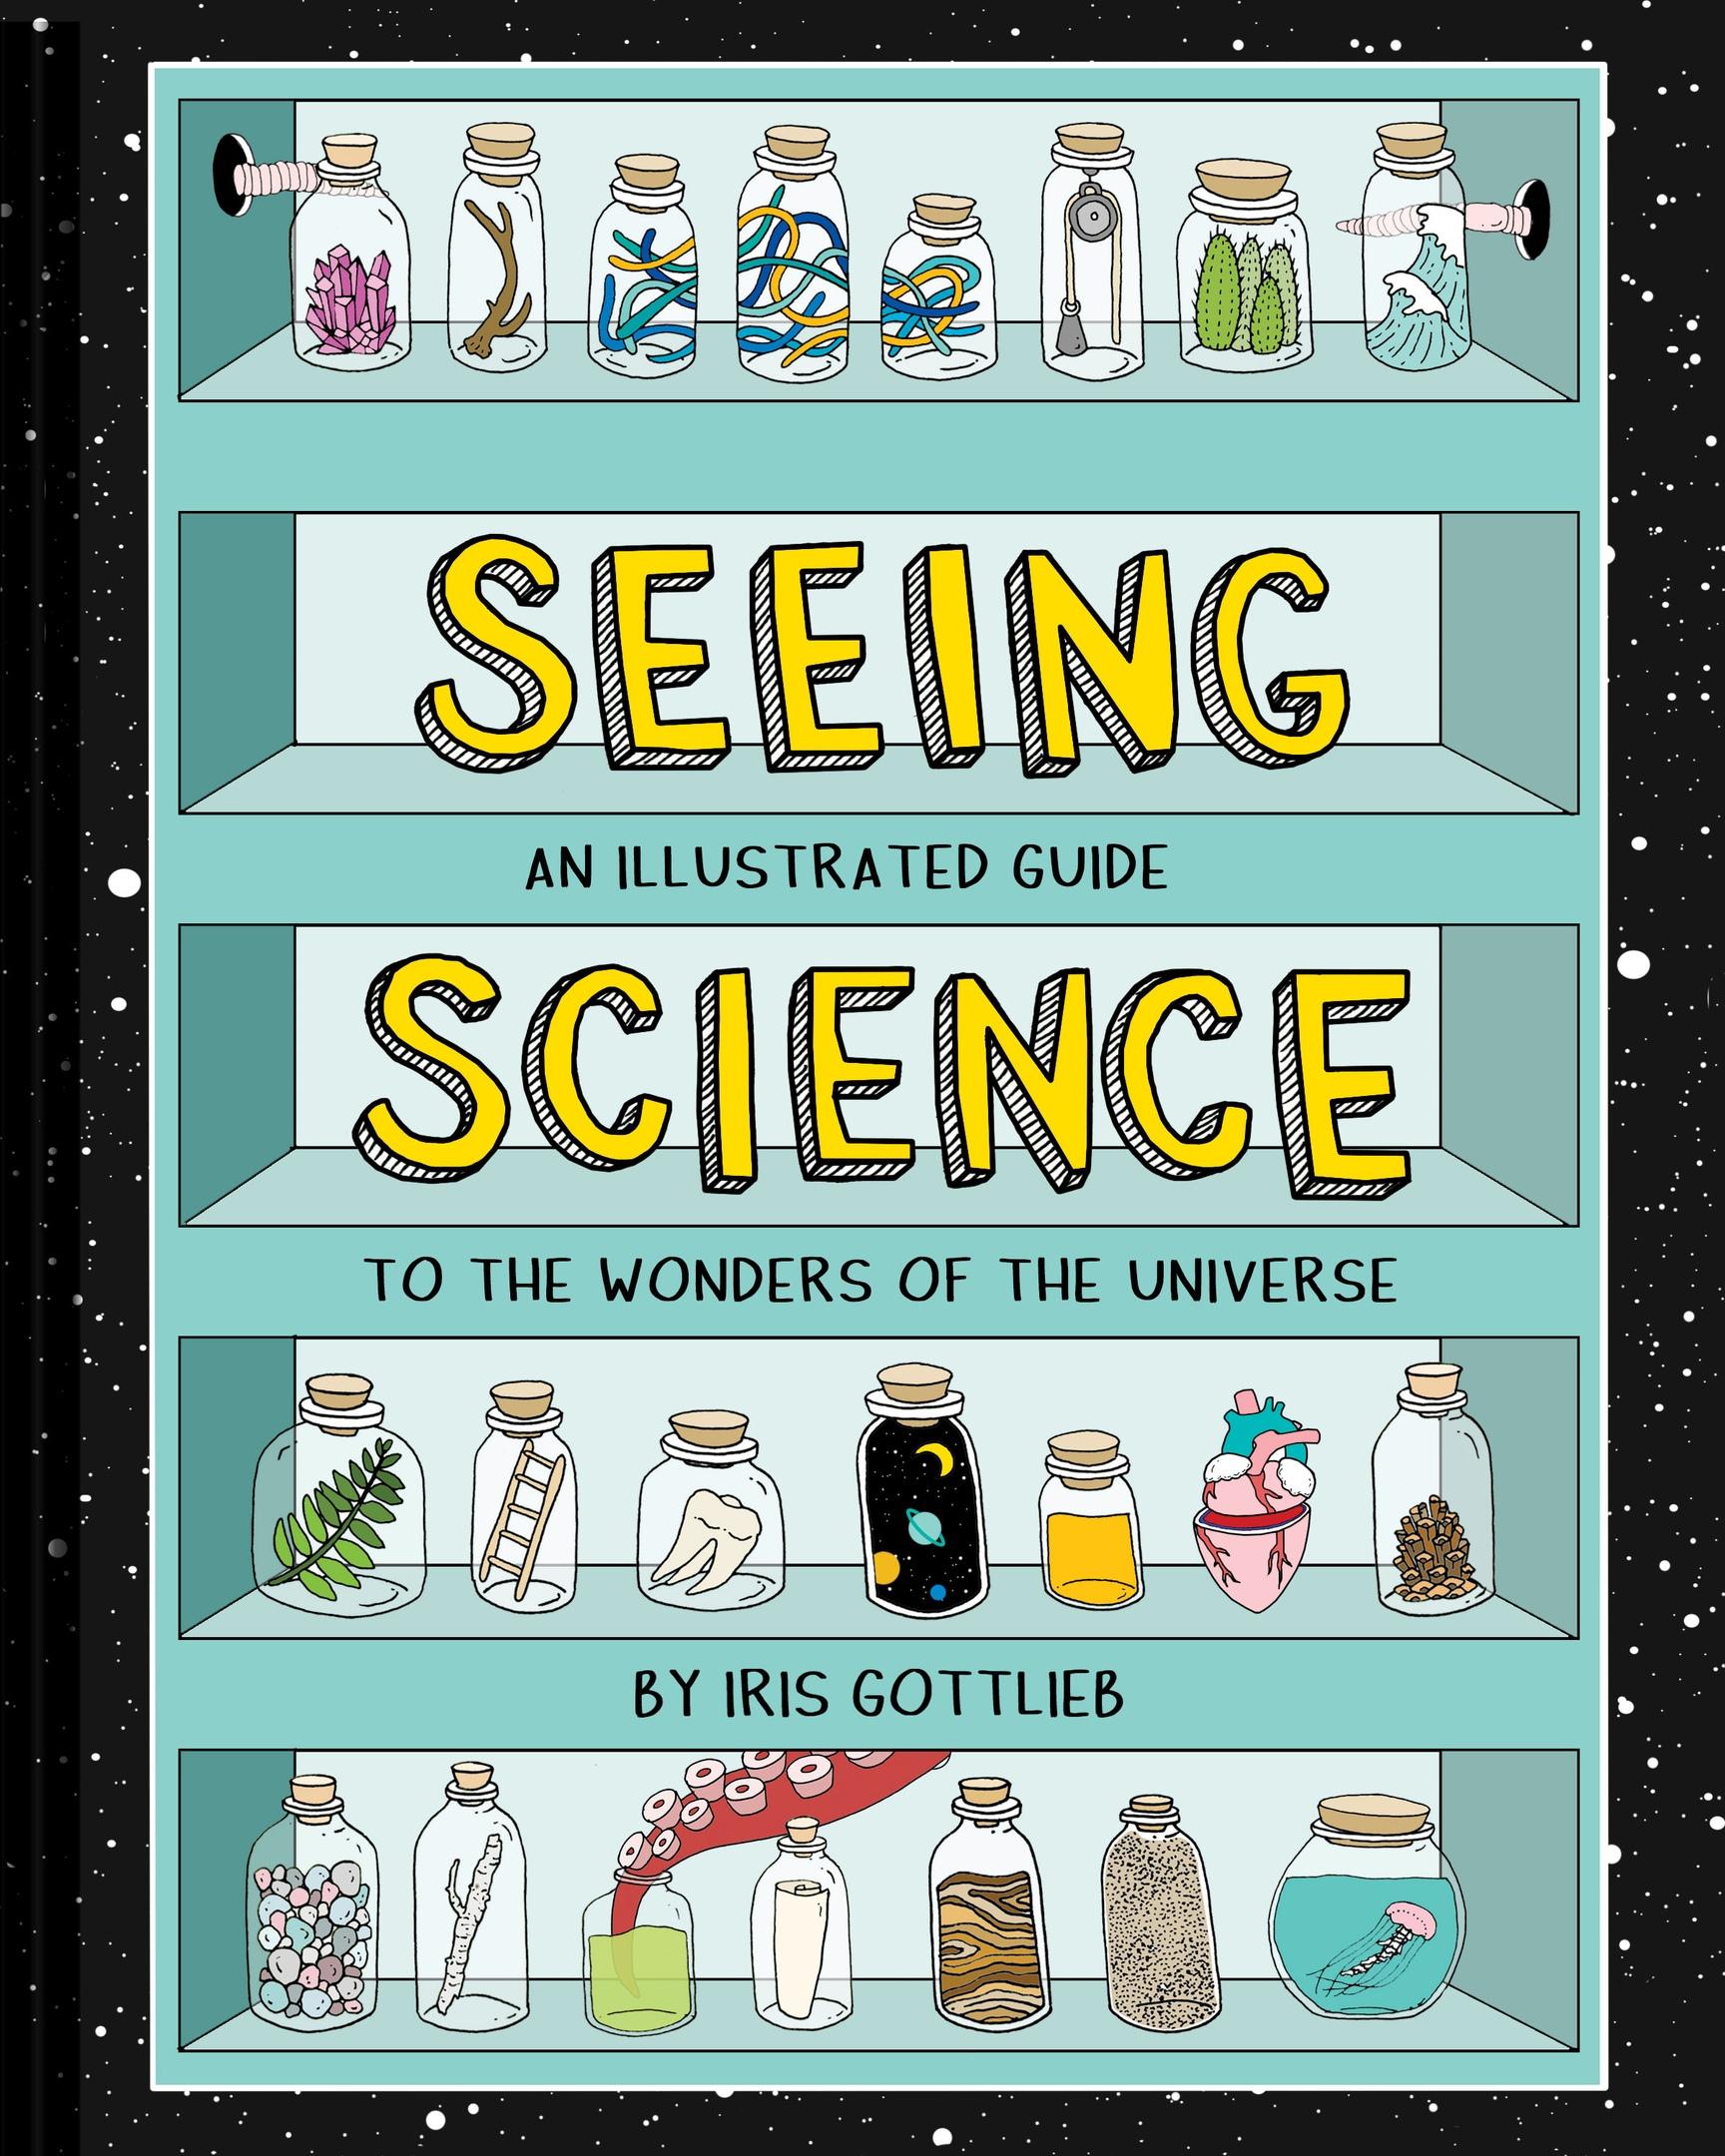 Iris Gottlieb – Seeing Science